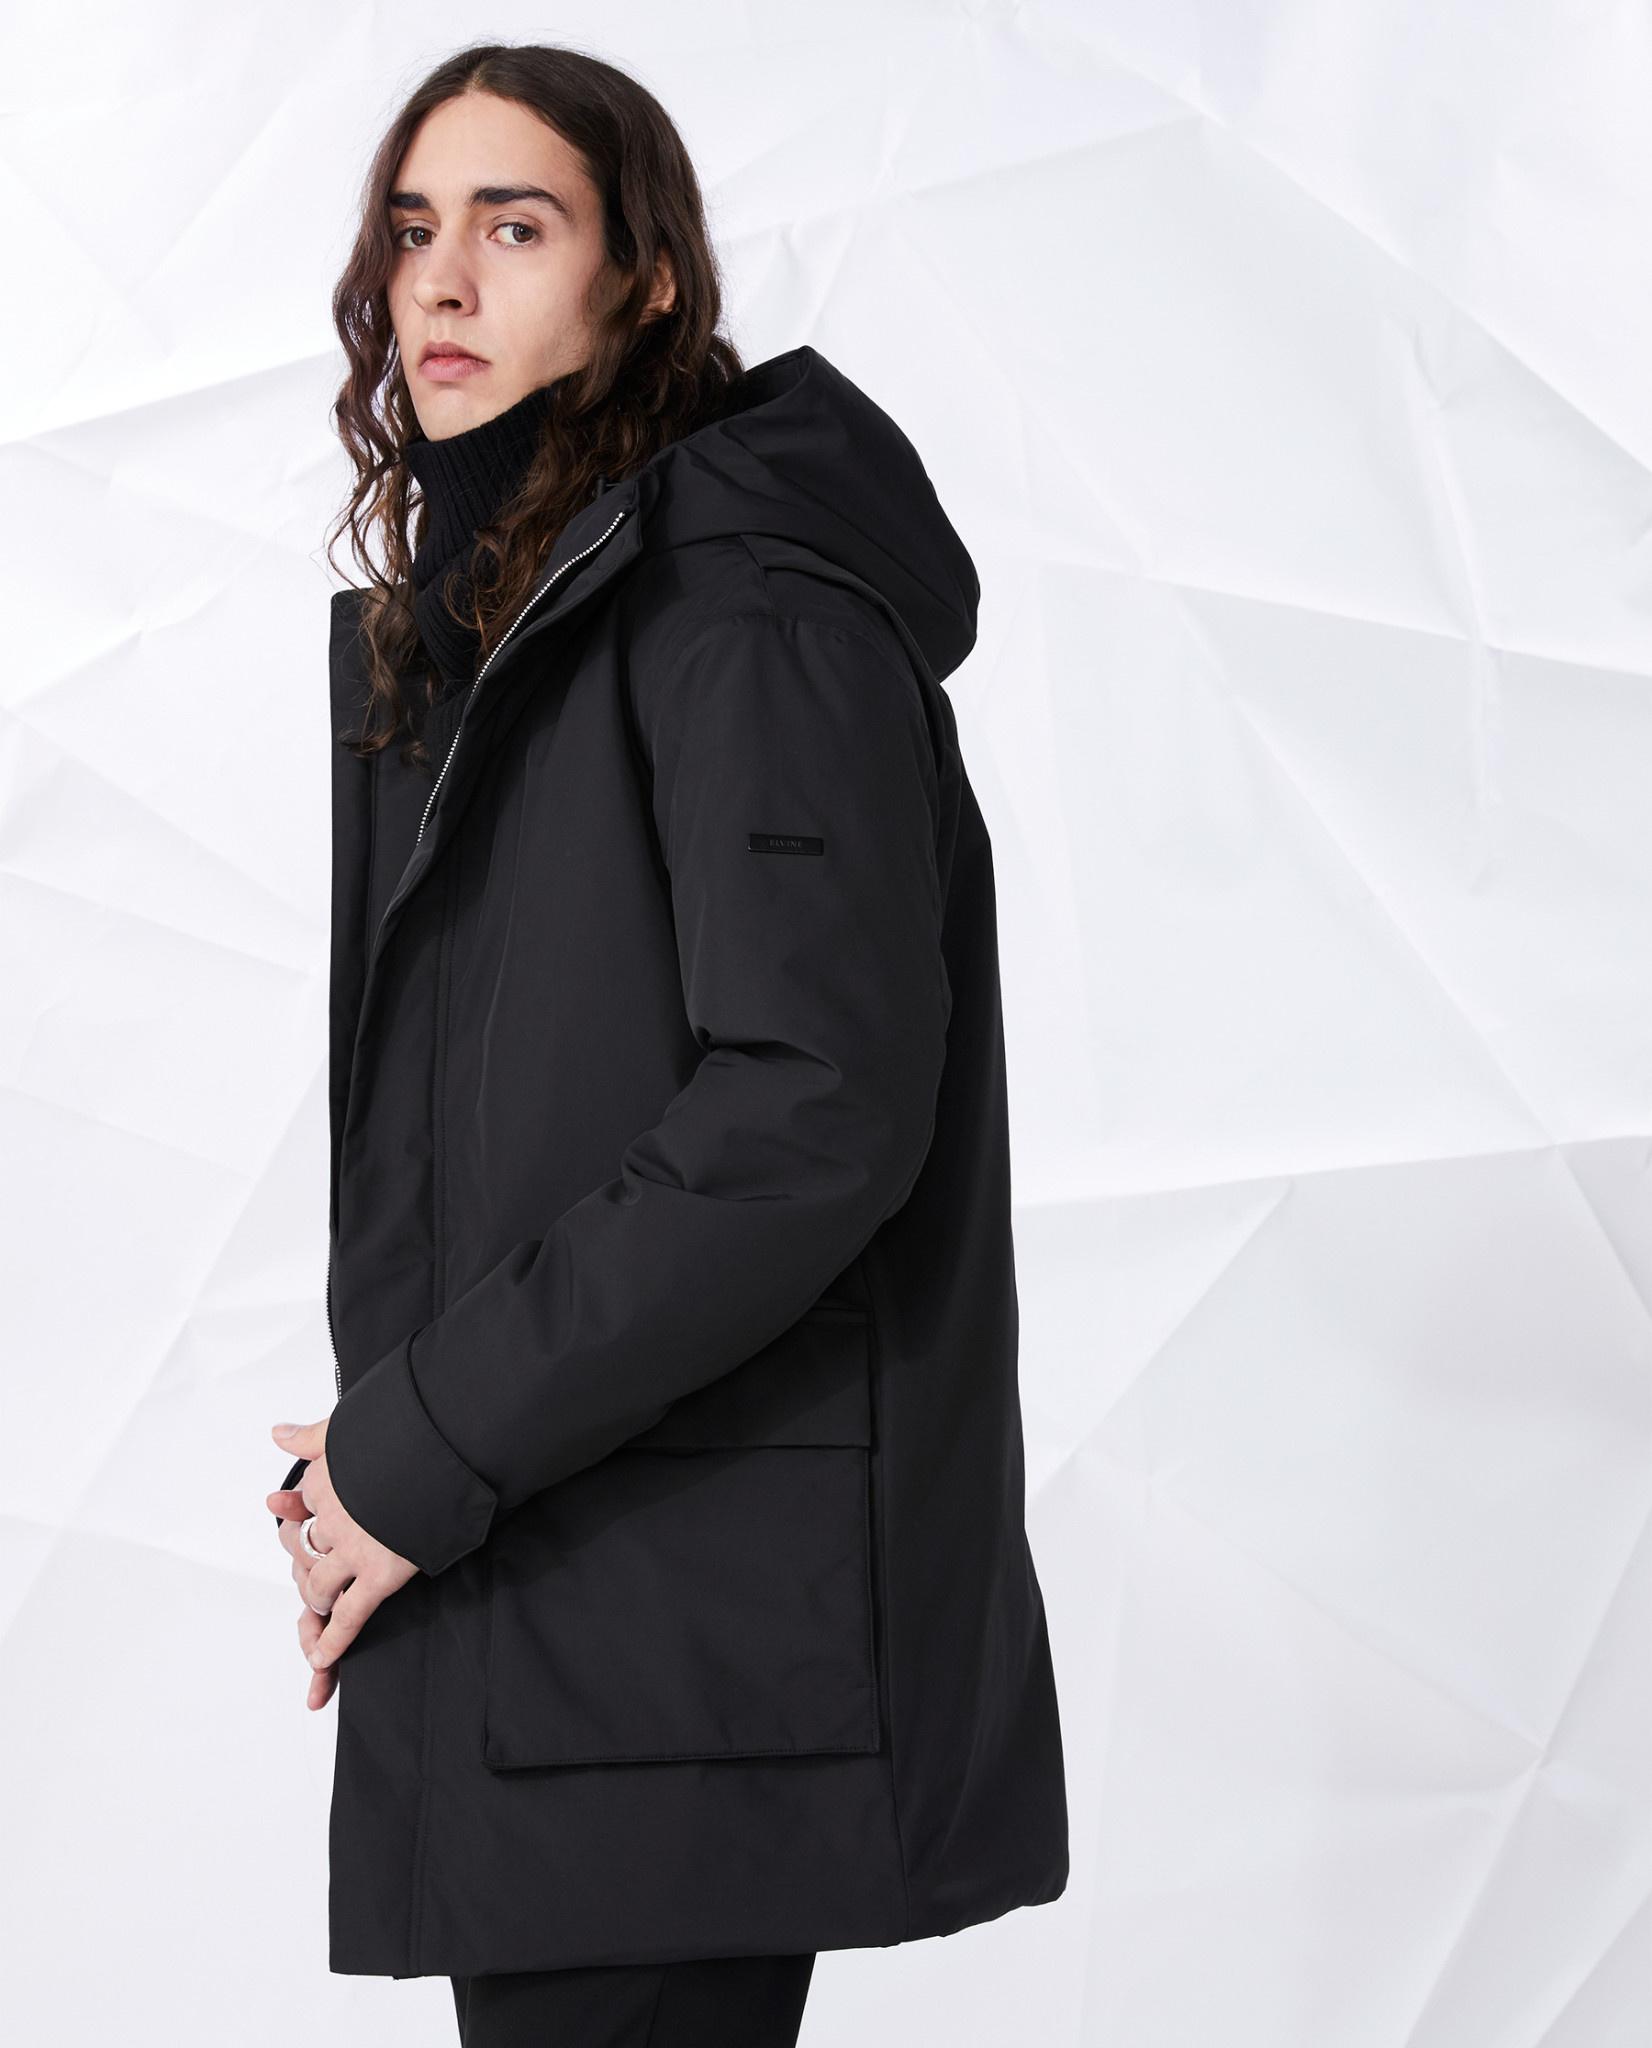 Elvine Elvine Yarden Jacket Black